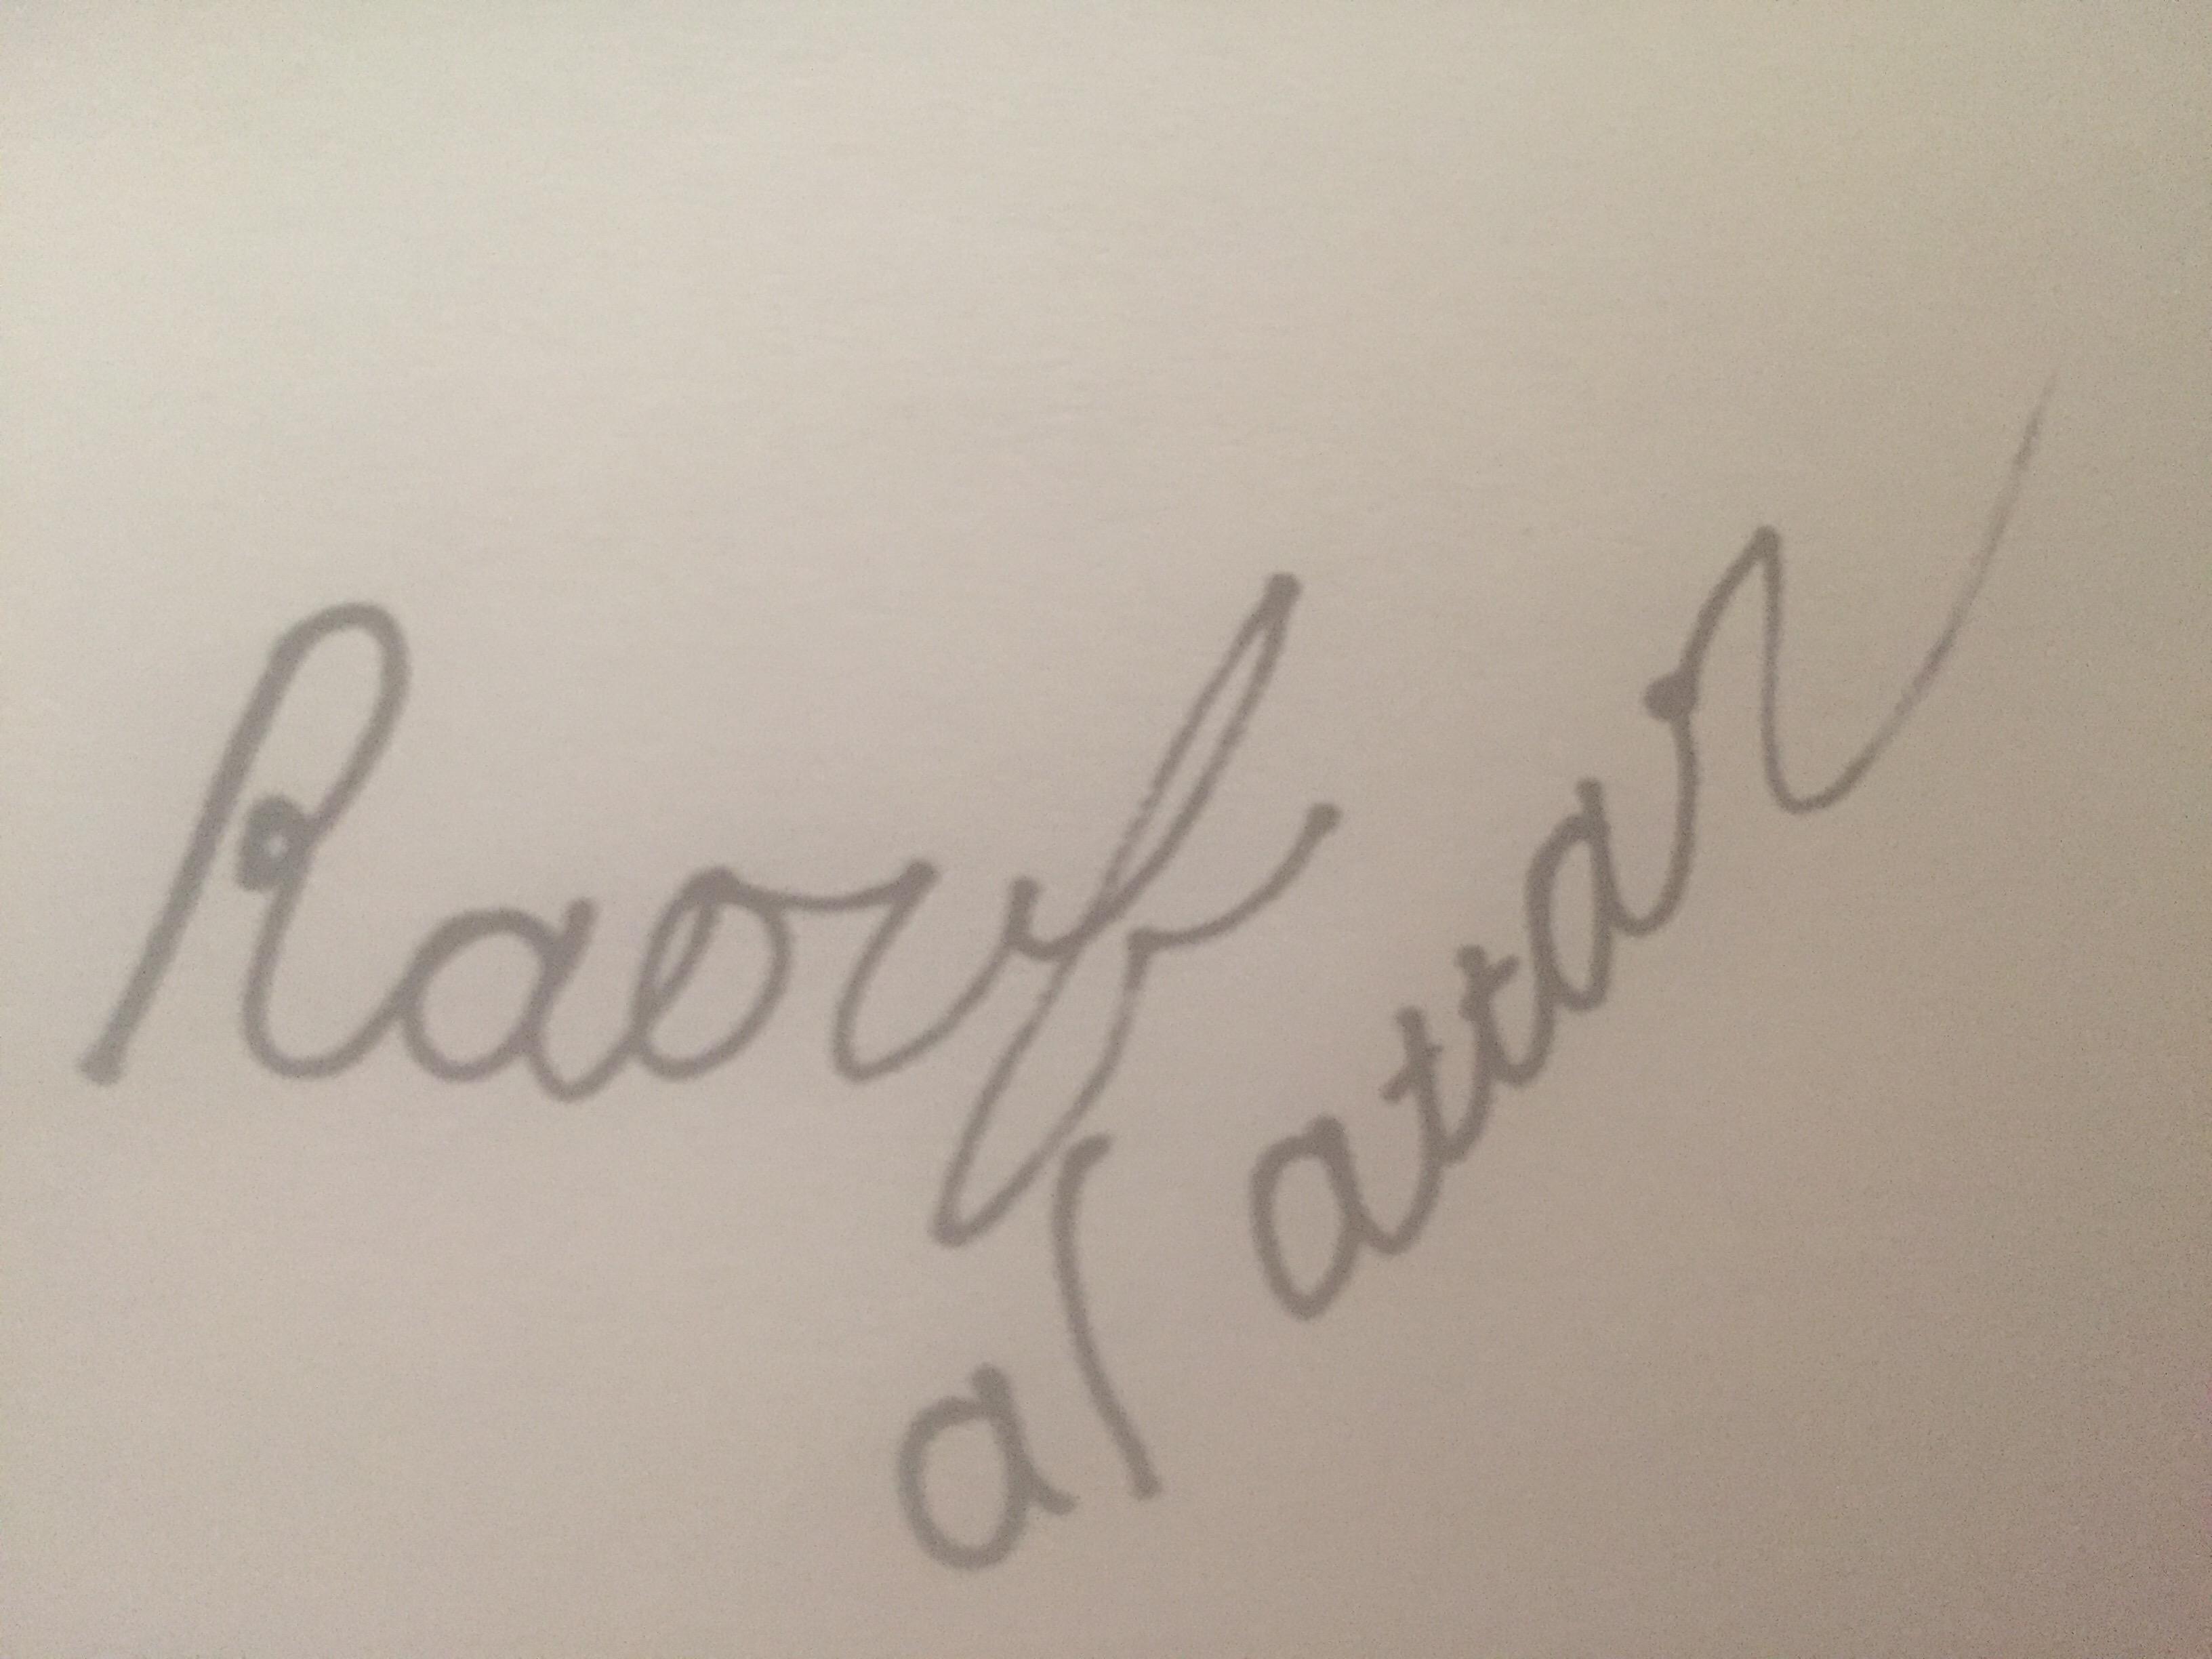 Raouf Alattar's Signature